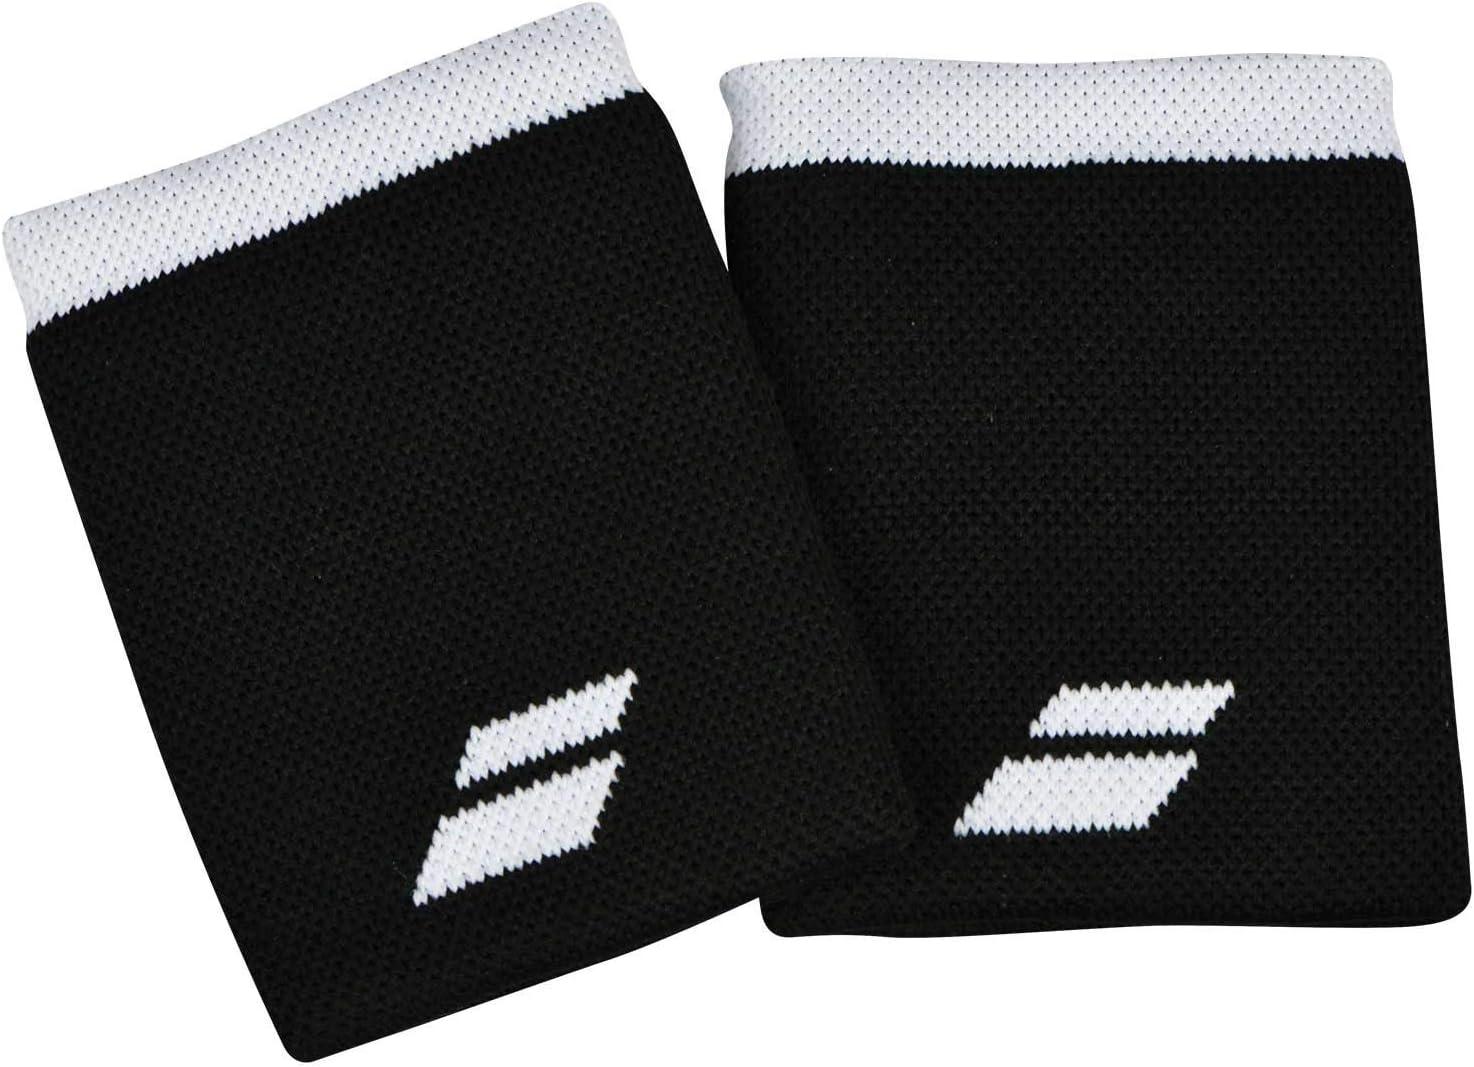 Babolat Logo Jumbo Wristband Muñequera, Adultos Unisex, Black/White (Multicolor), Talla Única: Amazon.es: Deportes y aire libre